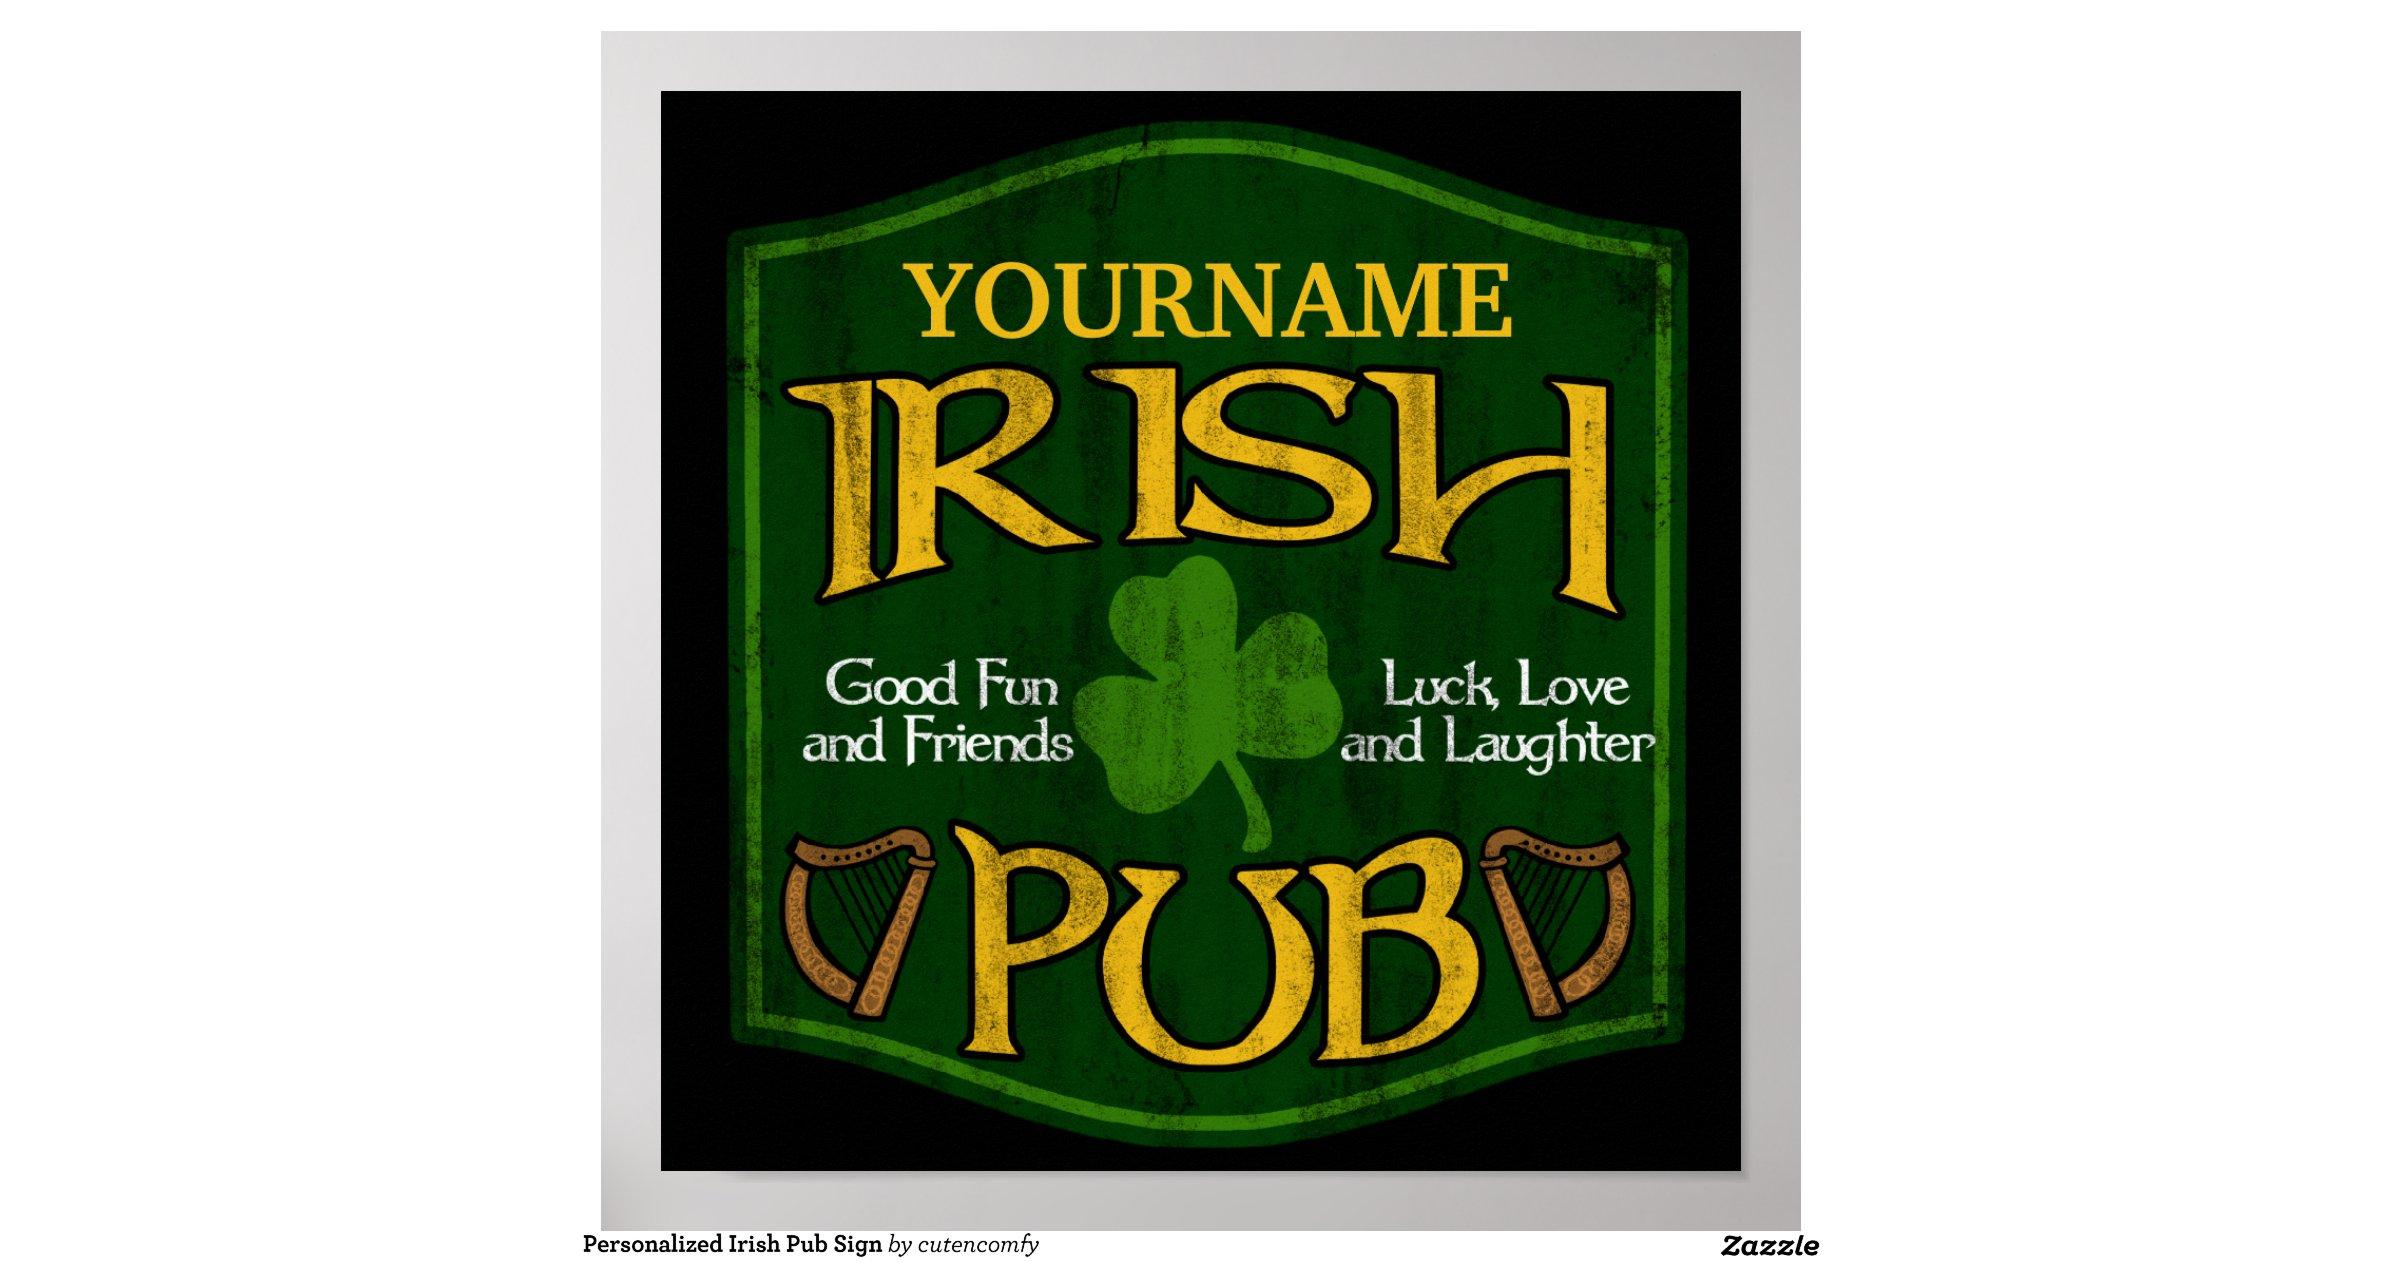 Personalized Irish Pub Sign Print Zazzle